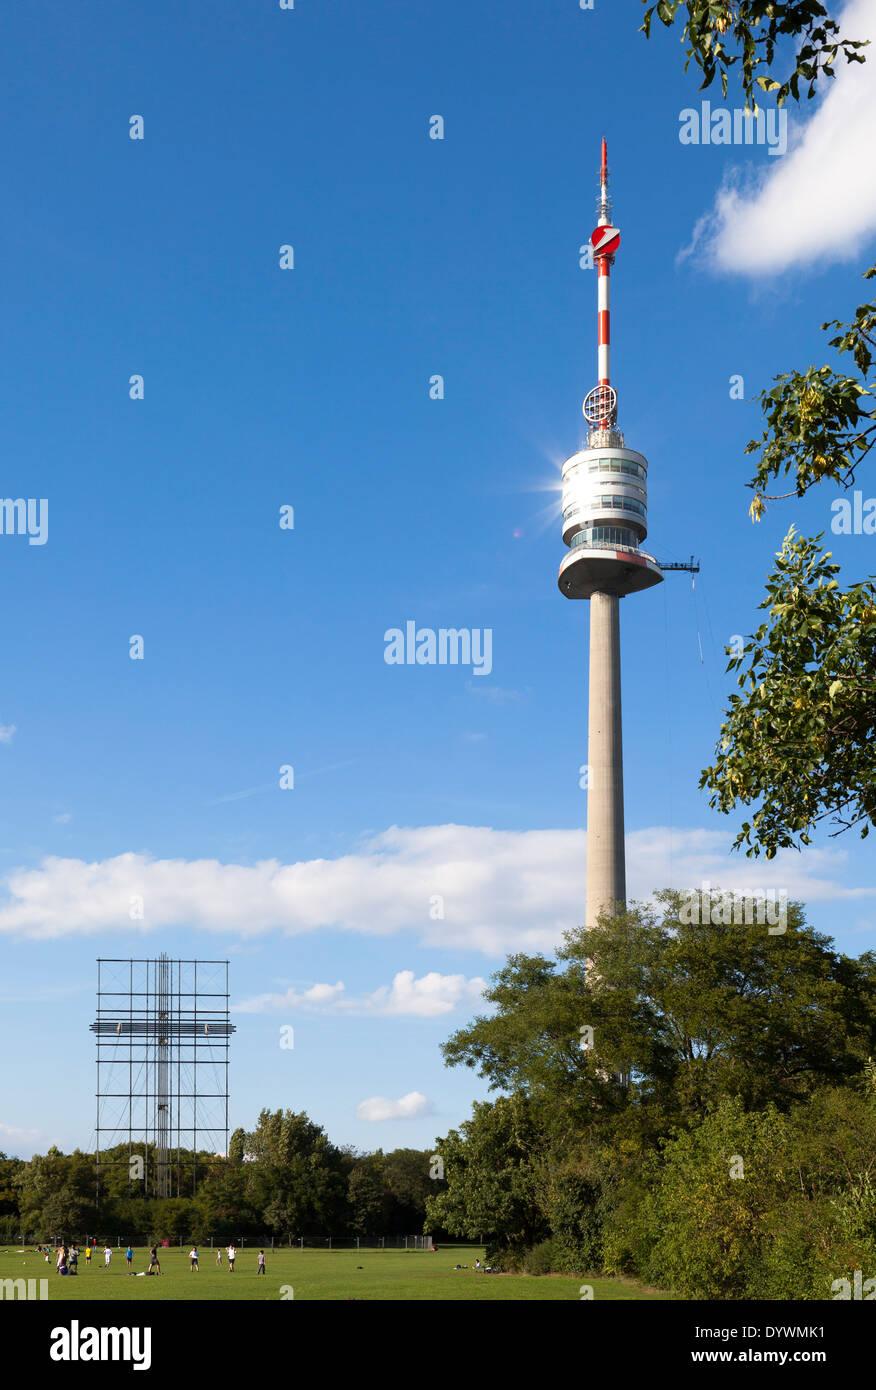 Danube Tower, Danube Park, Vienna, Austria - Stock Image